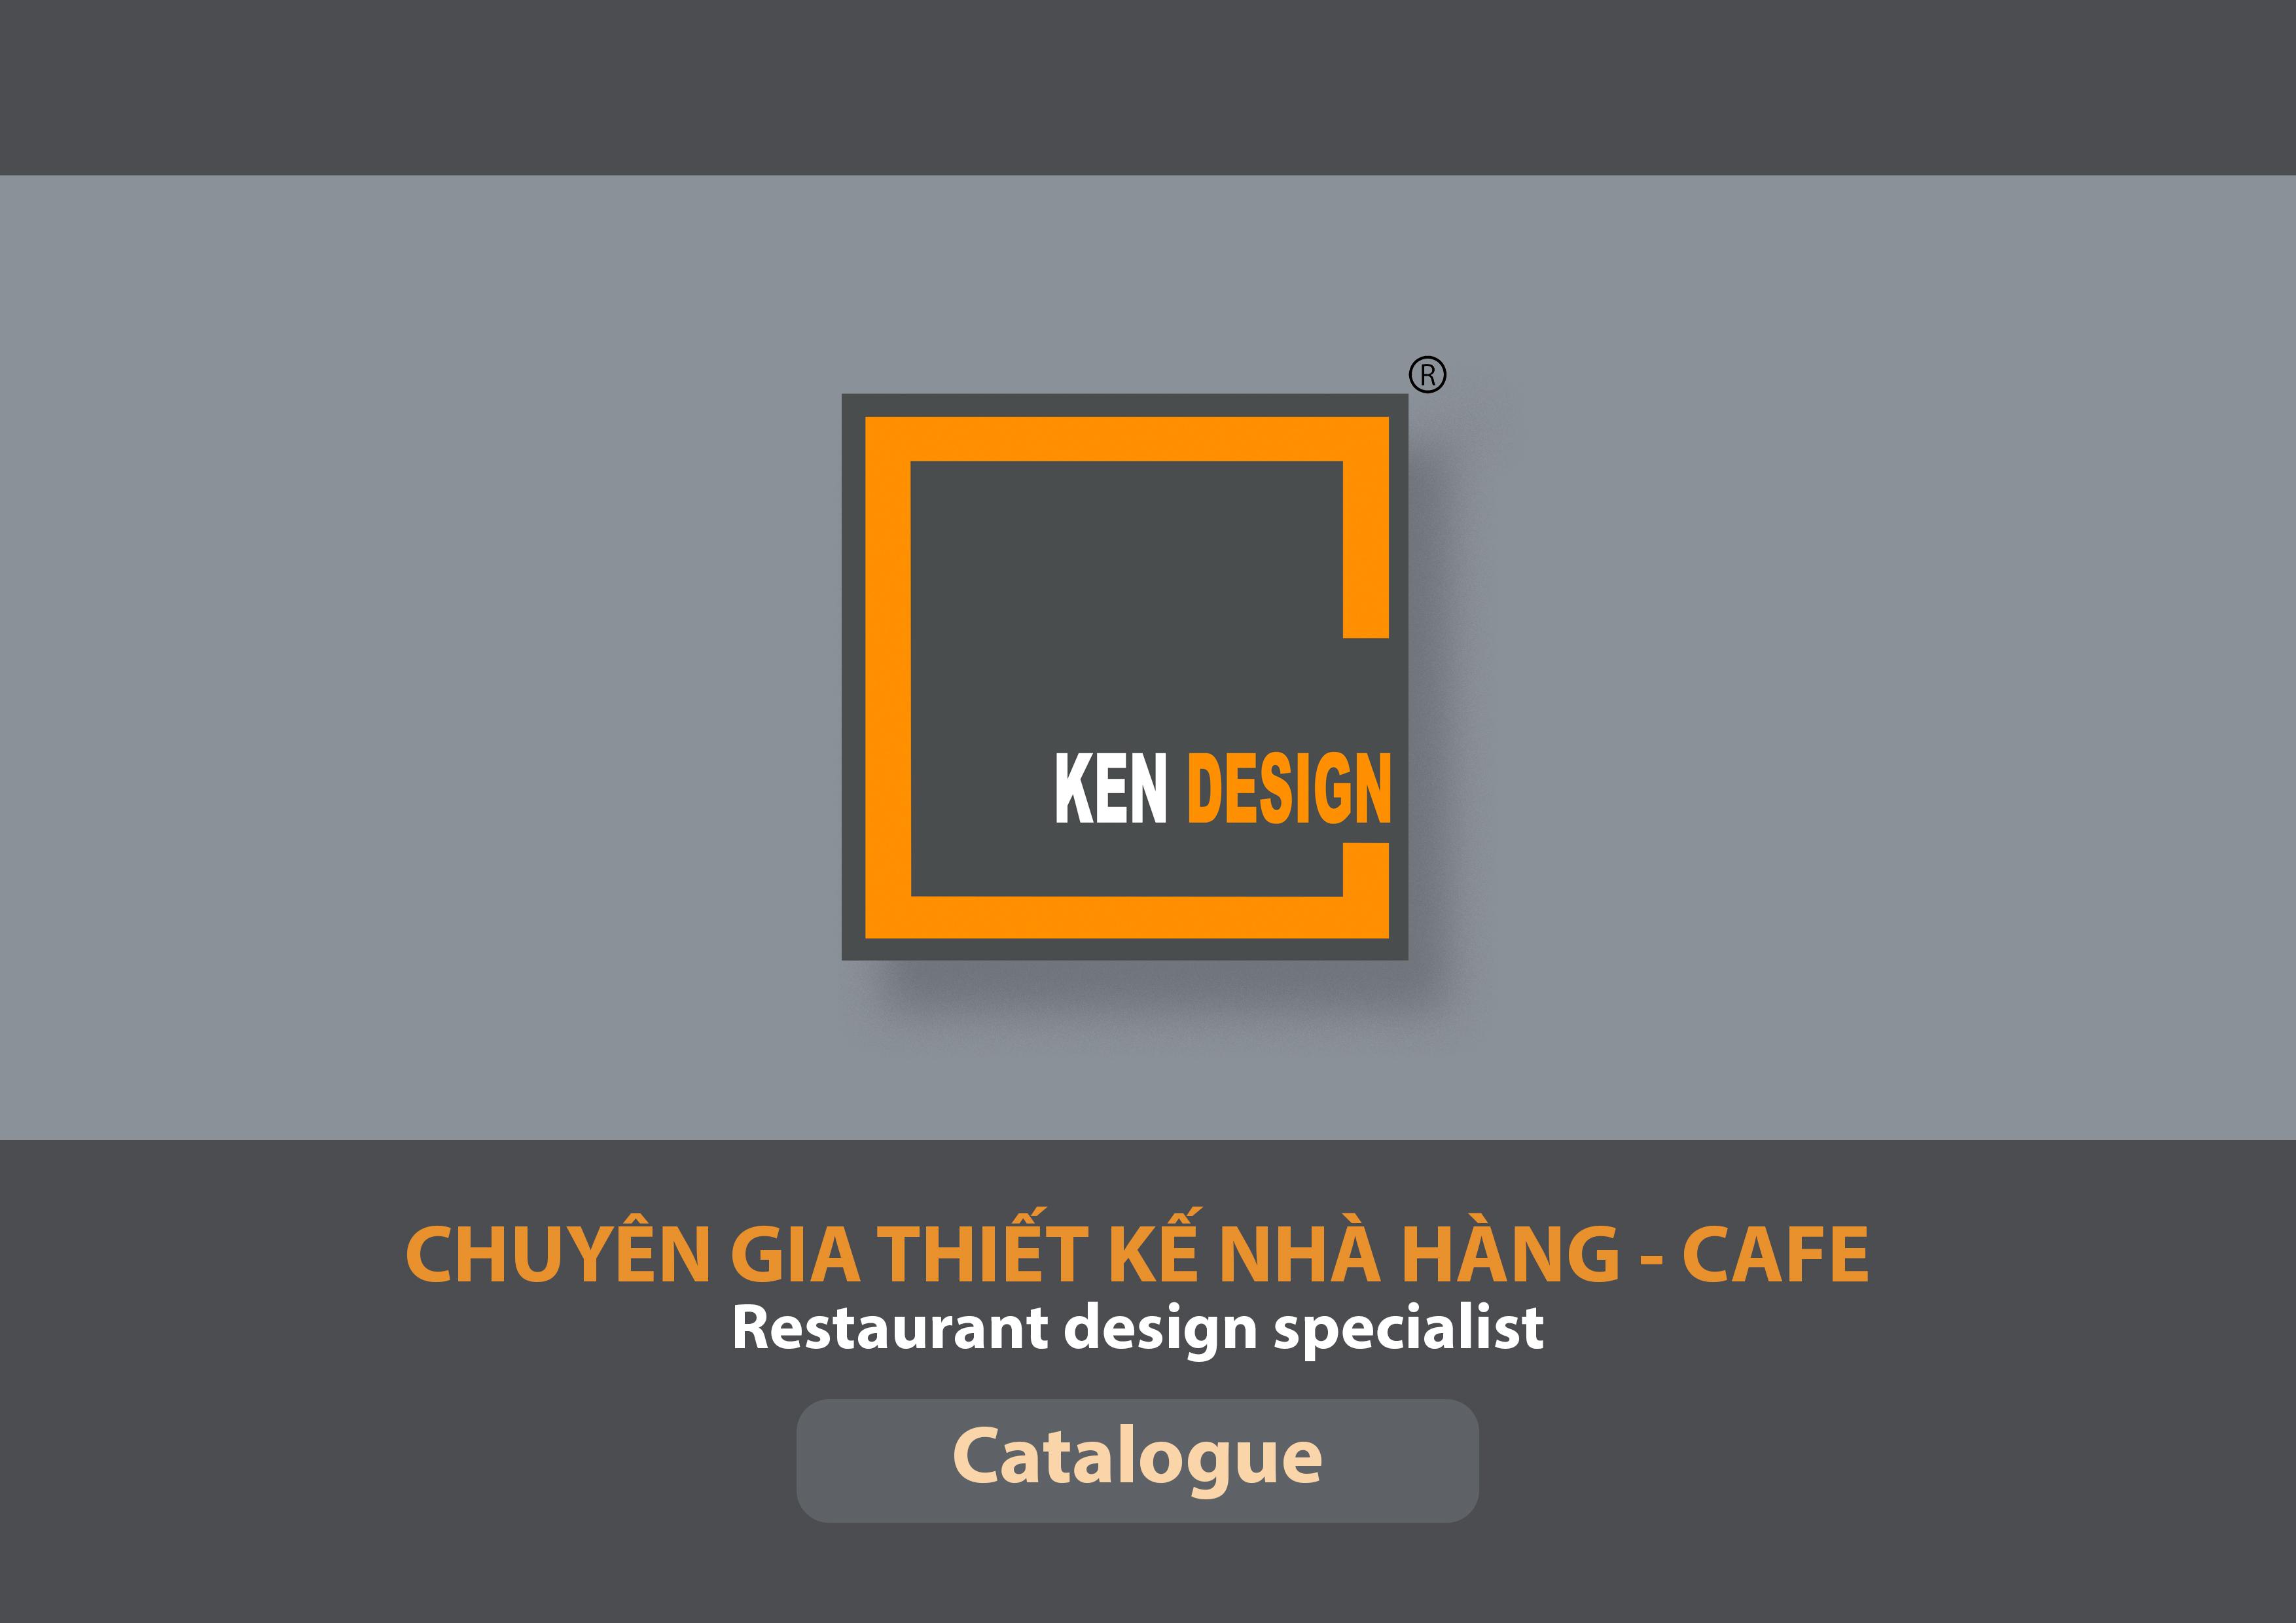 catalogue kendesign